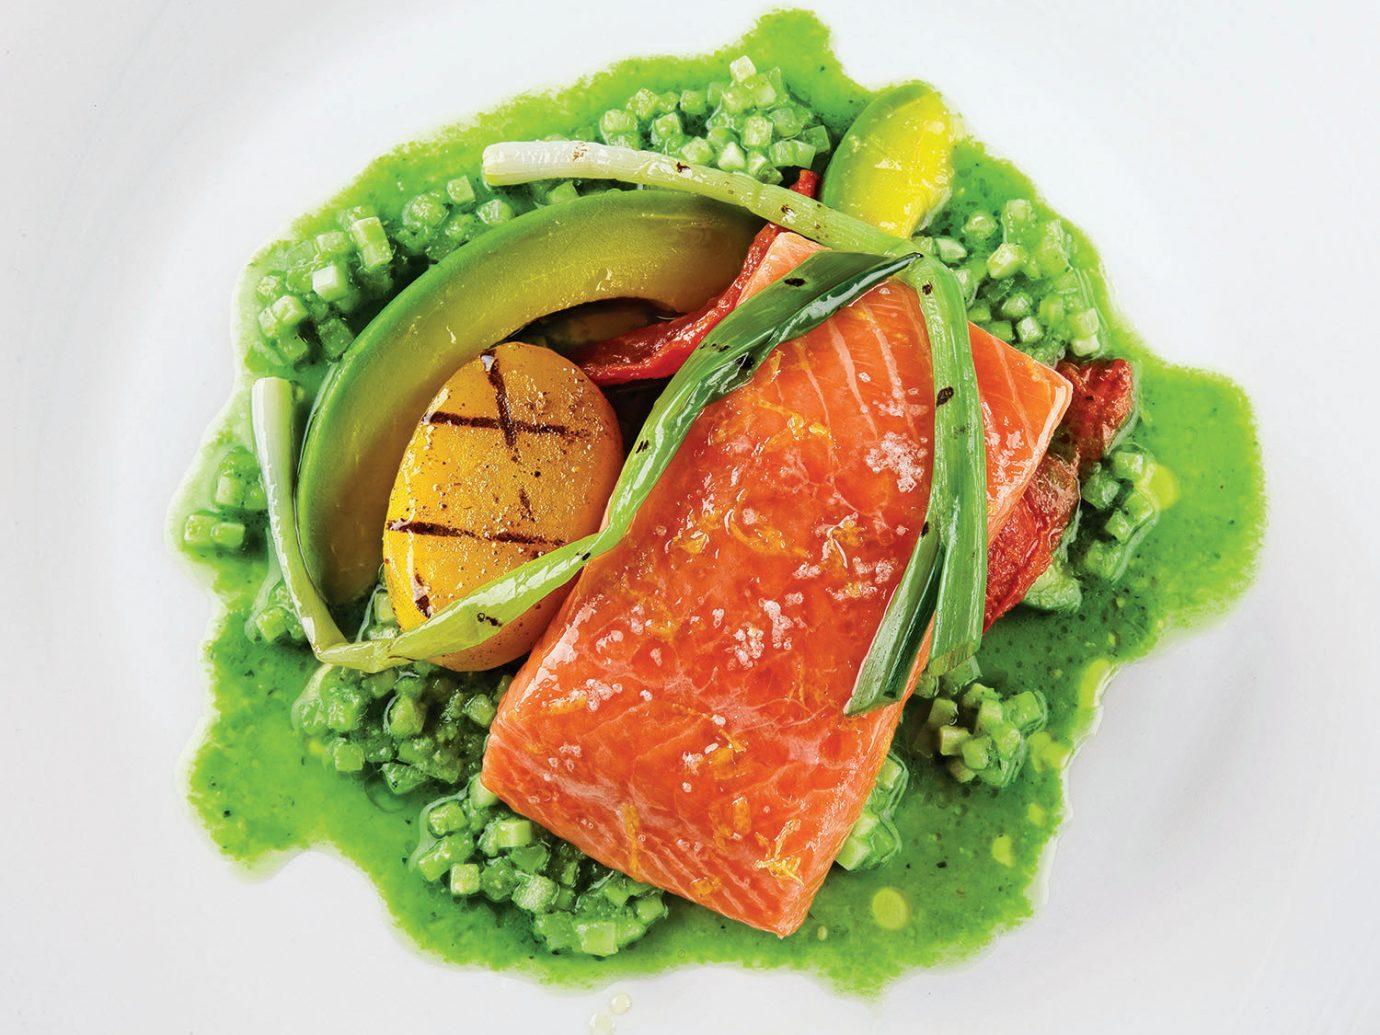 Jetsetter Guides food dish plate produce vegetable salad smoked salmon cuisine land plant fish meal vegetarian food salmon like fish salmon meat flowering plant fresh broccoli